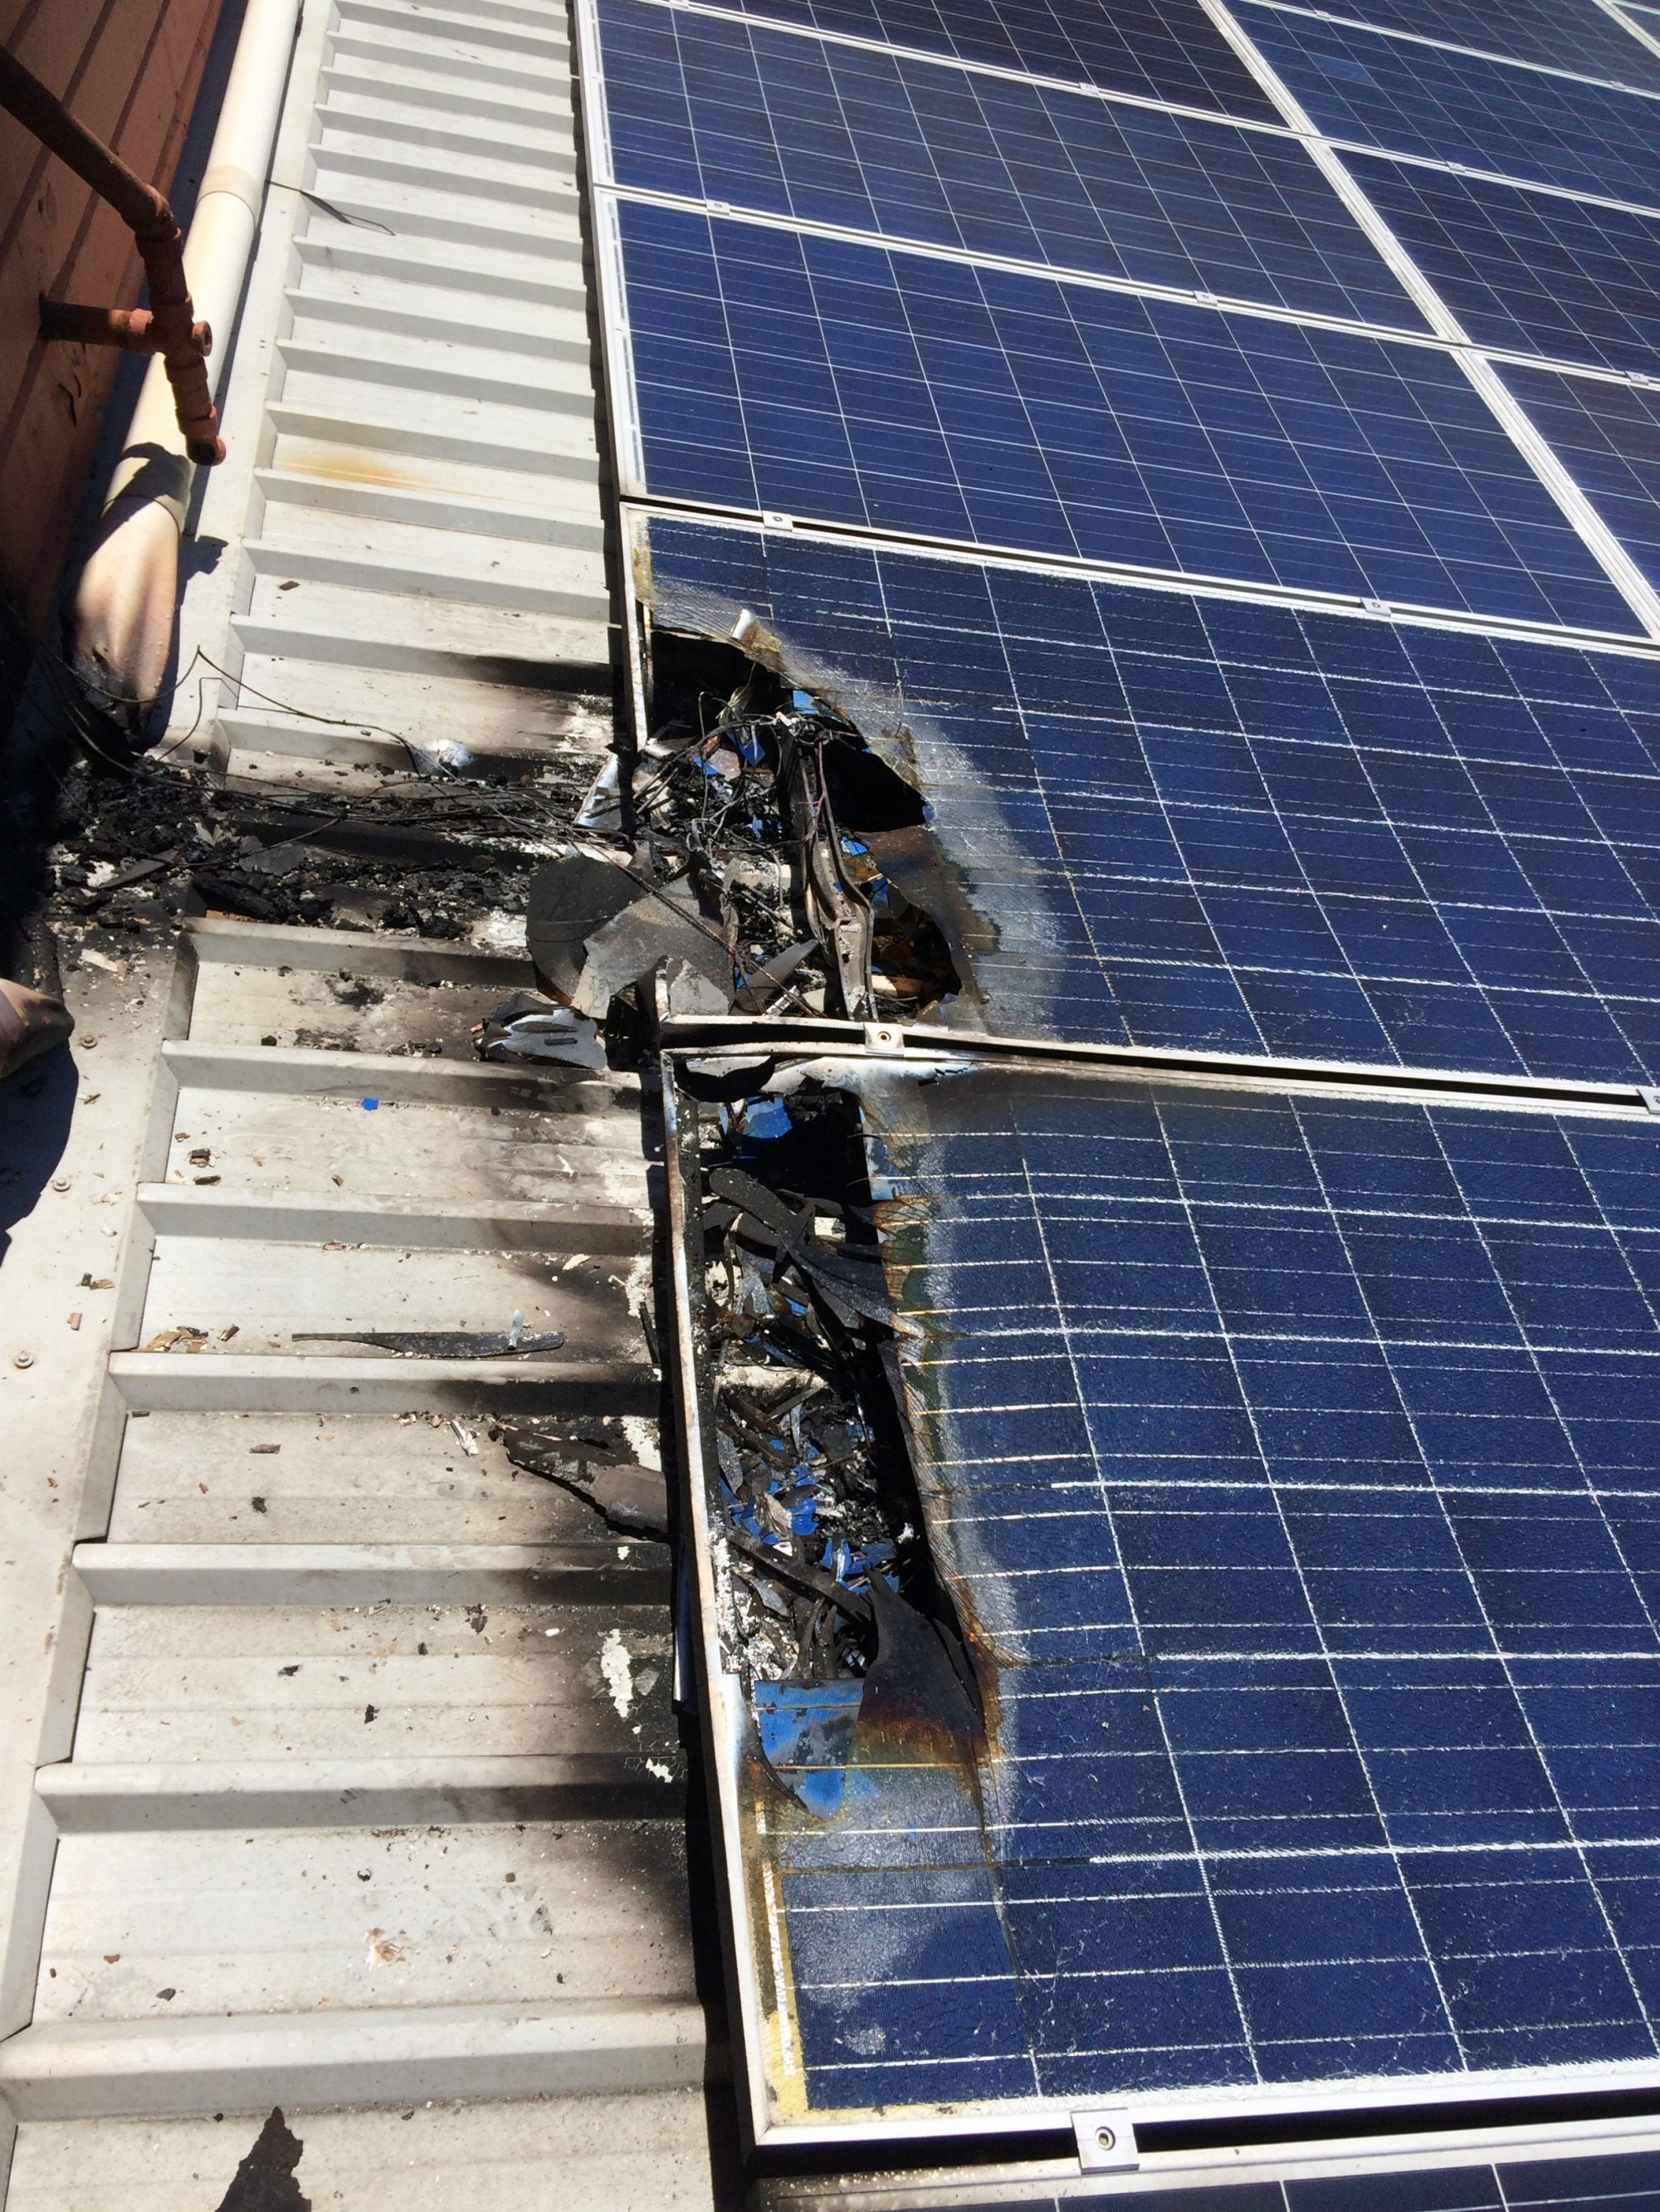 hight resolution of img 4067 img 4068 img 4070 solar panel fire australia 13413772 10153555269716003 1940542117922690903 n 13422427 1339086786116502 555475872343255825 o